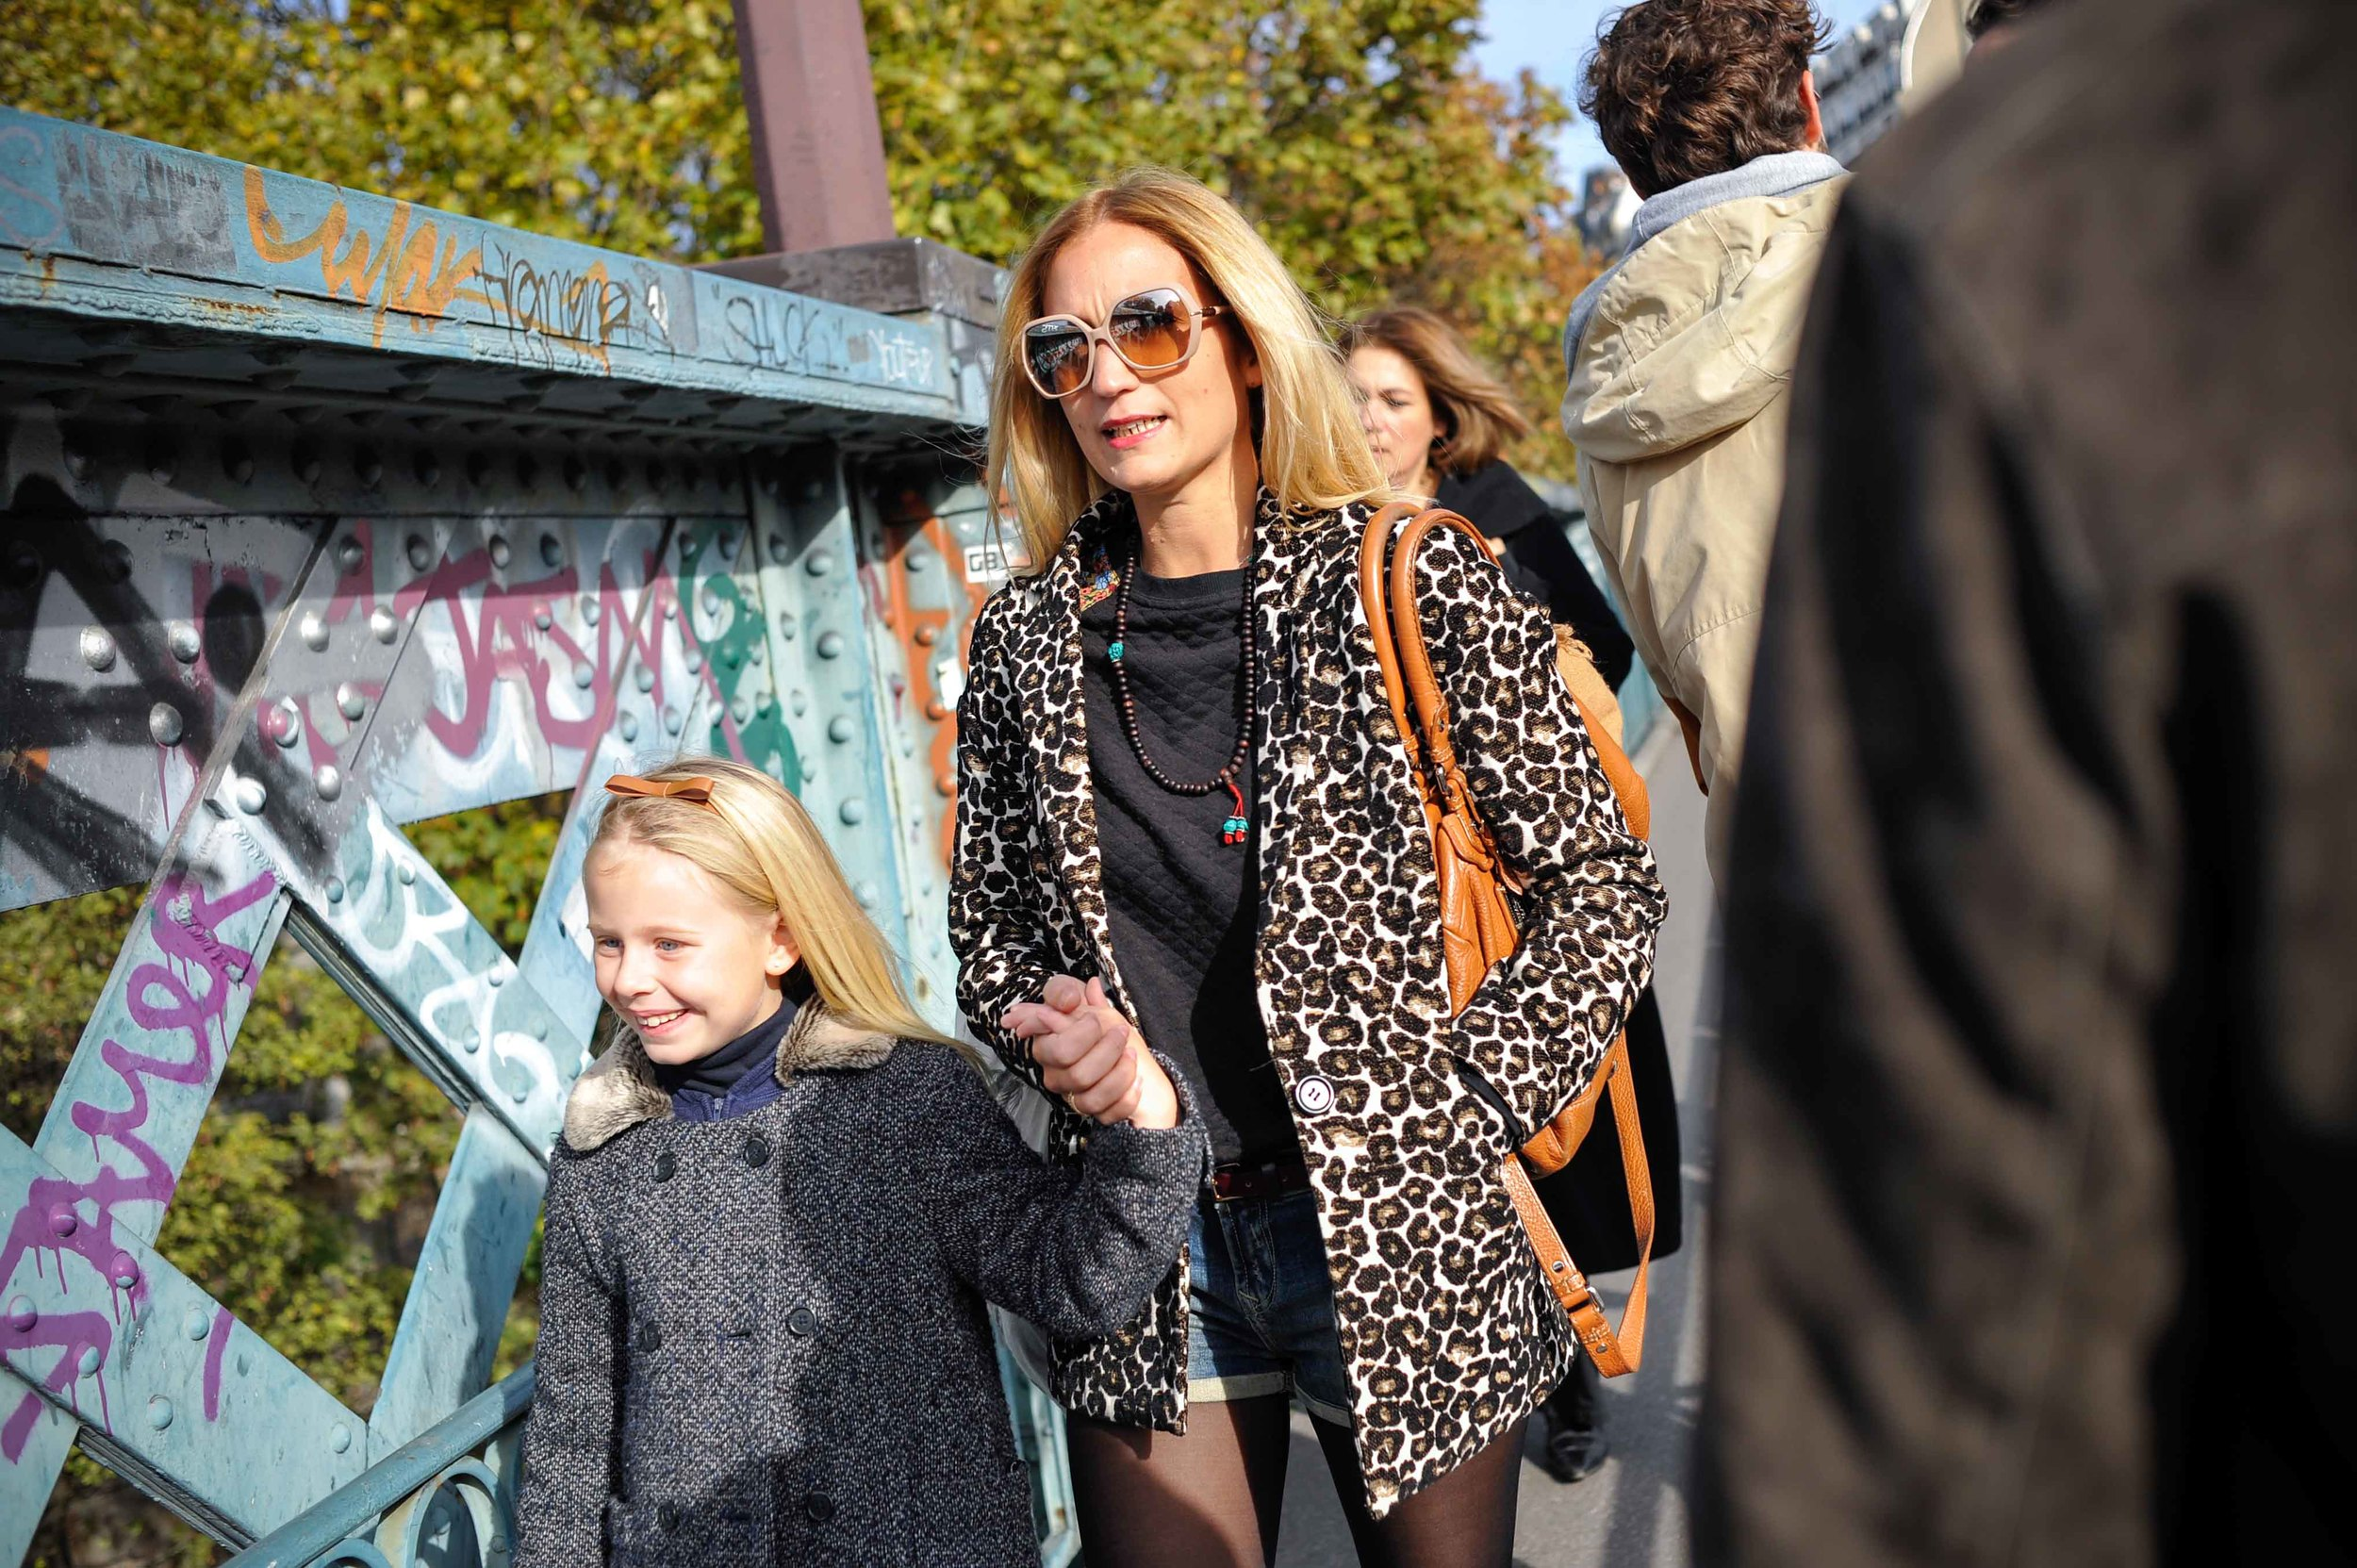 Paris_web_2014-11.jpg